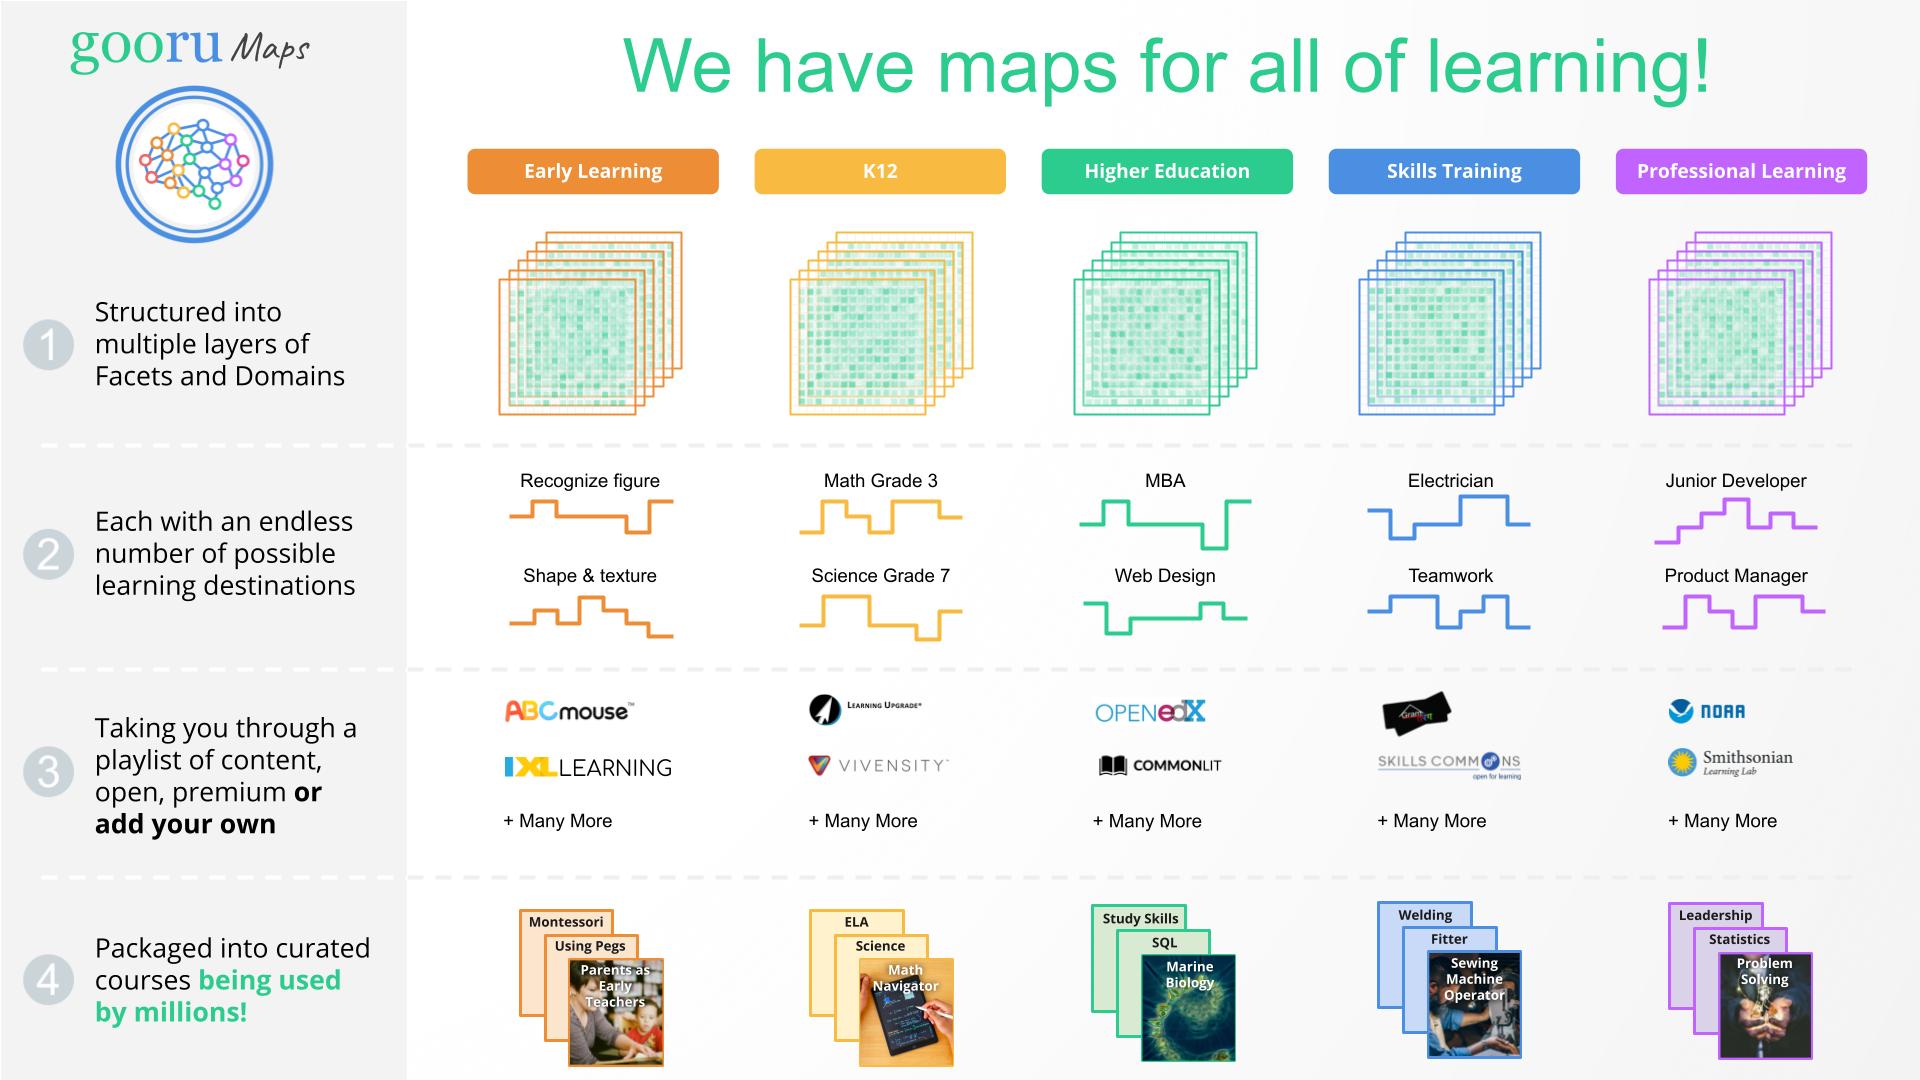 Gooru Maps